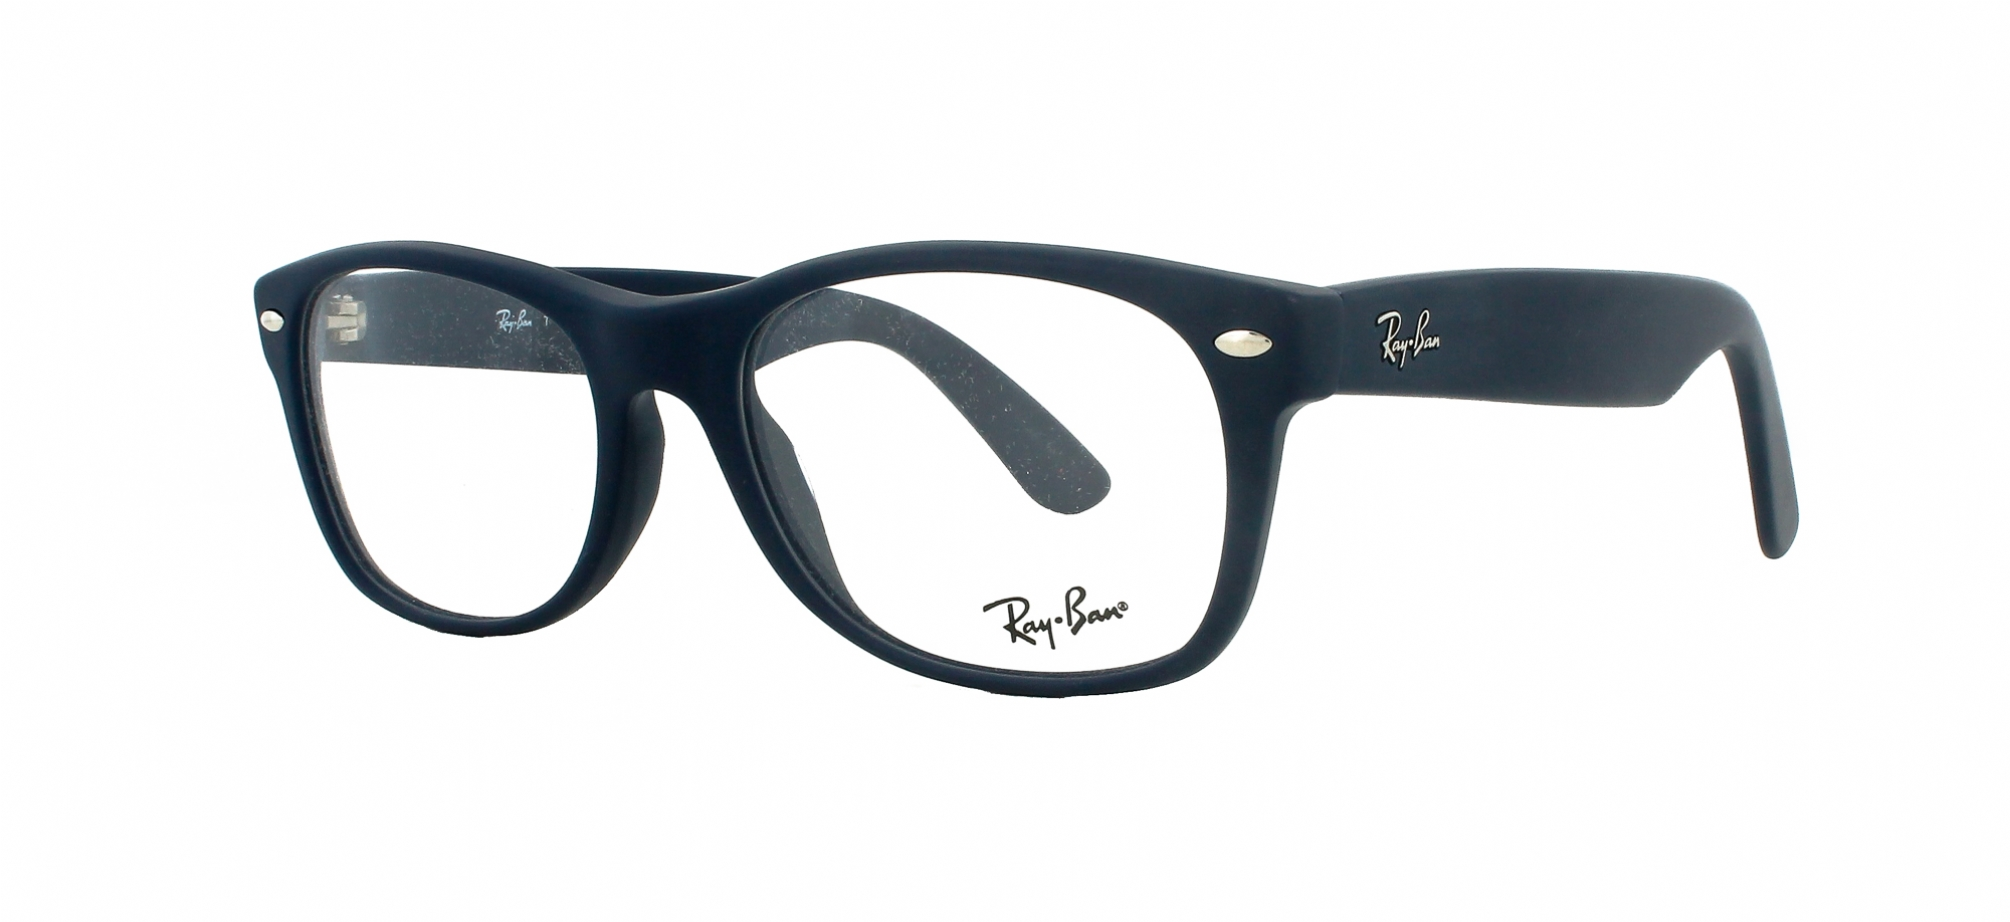 d17abc3069 Lei Peng Sunglasses Ray Ban Qb2457 « One More Soul